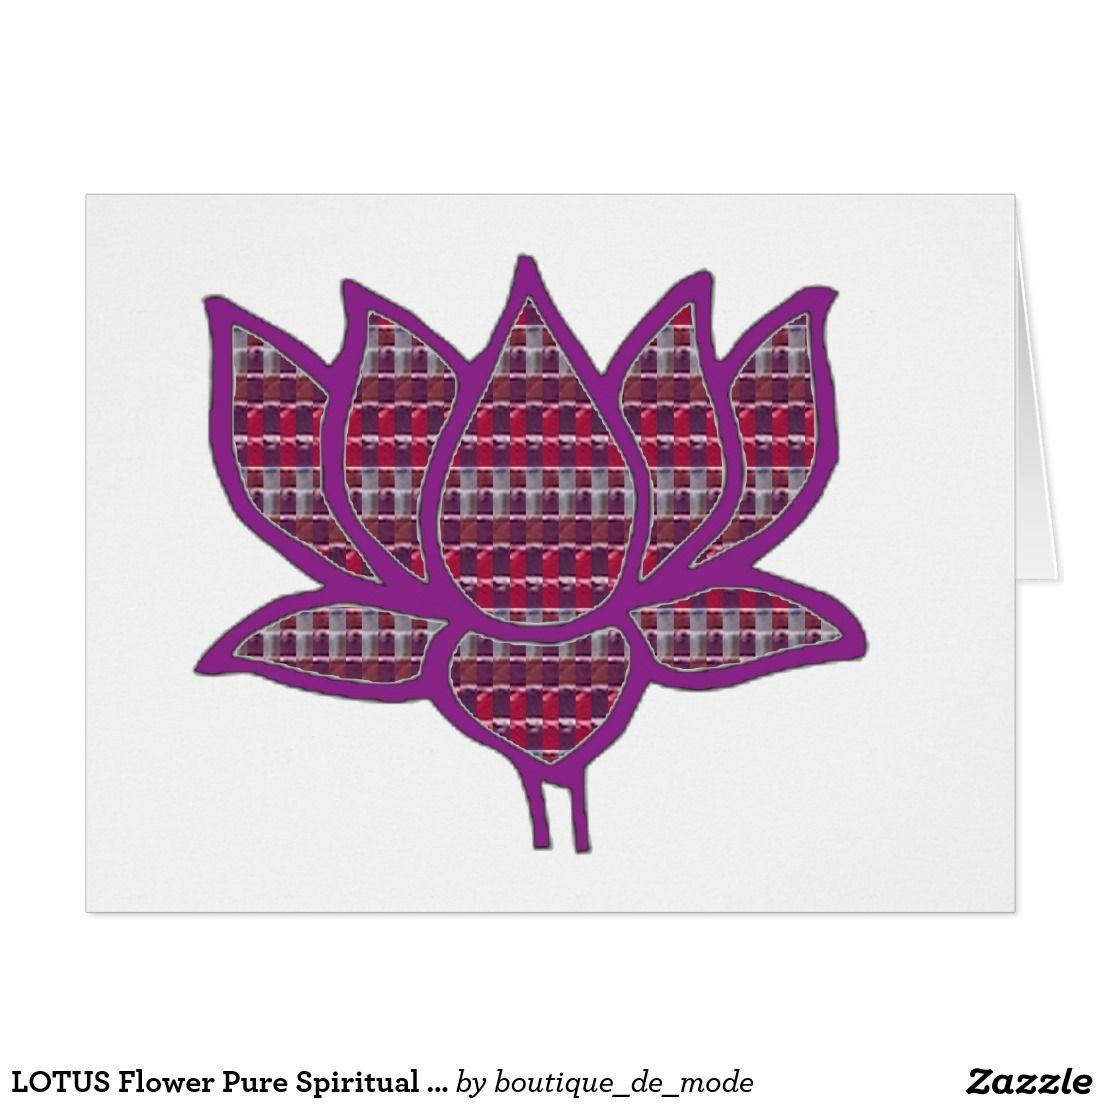 Lotus flower pure spiritual symbol peach nvn661 card 101 zazzle lotus flower pure spiritual symbol peach nvn661 card mightylinksfo